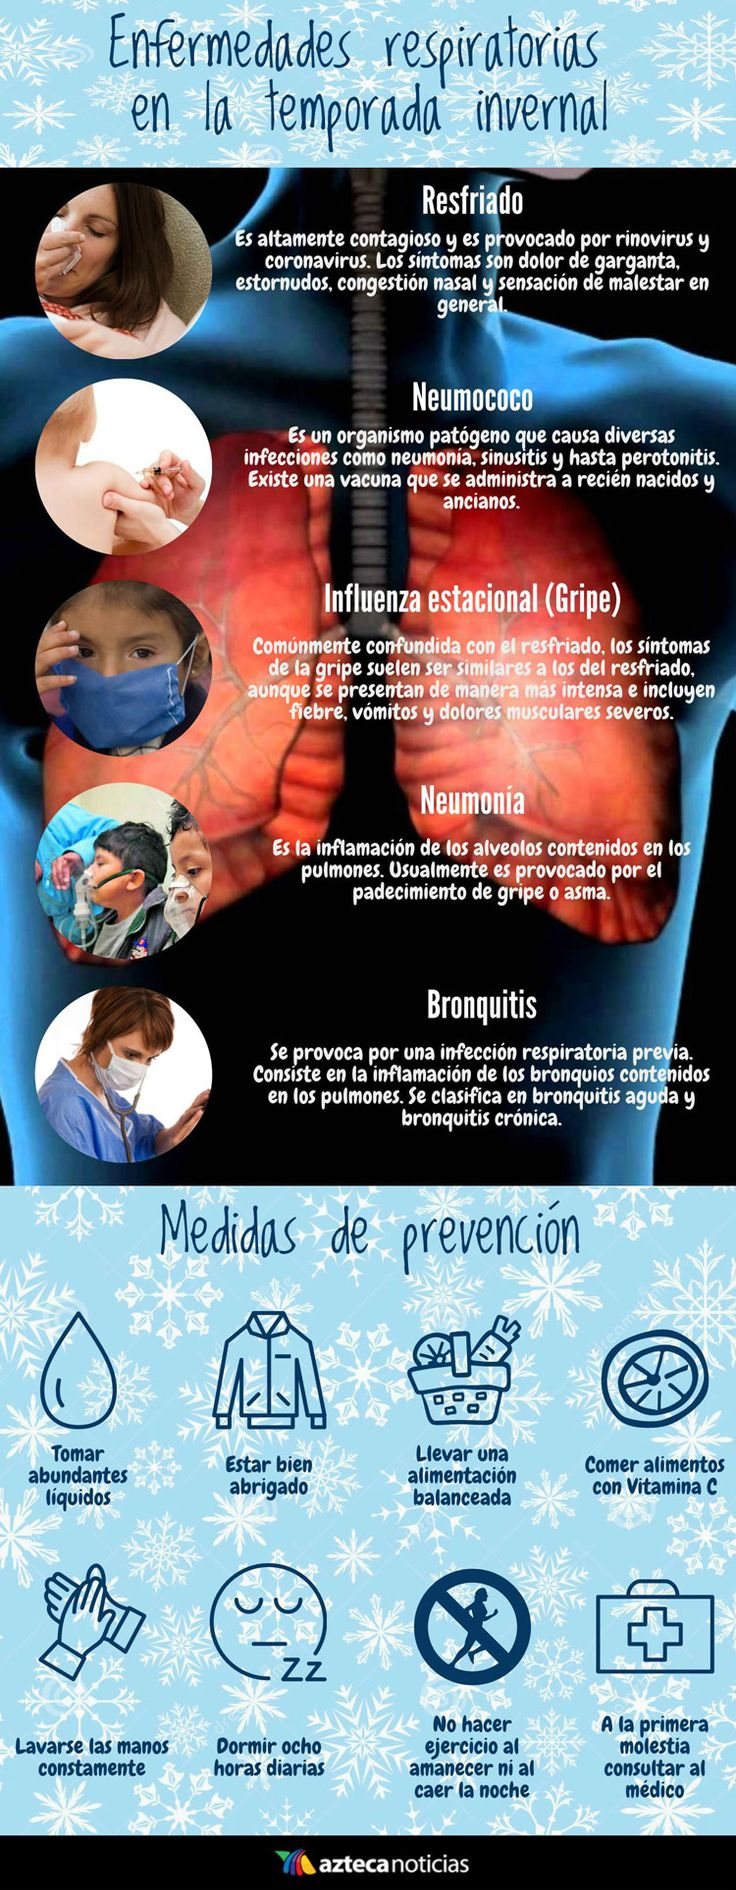 Enfermedades respiratorias en la temporada invernal #infografía